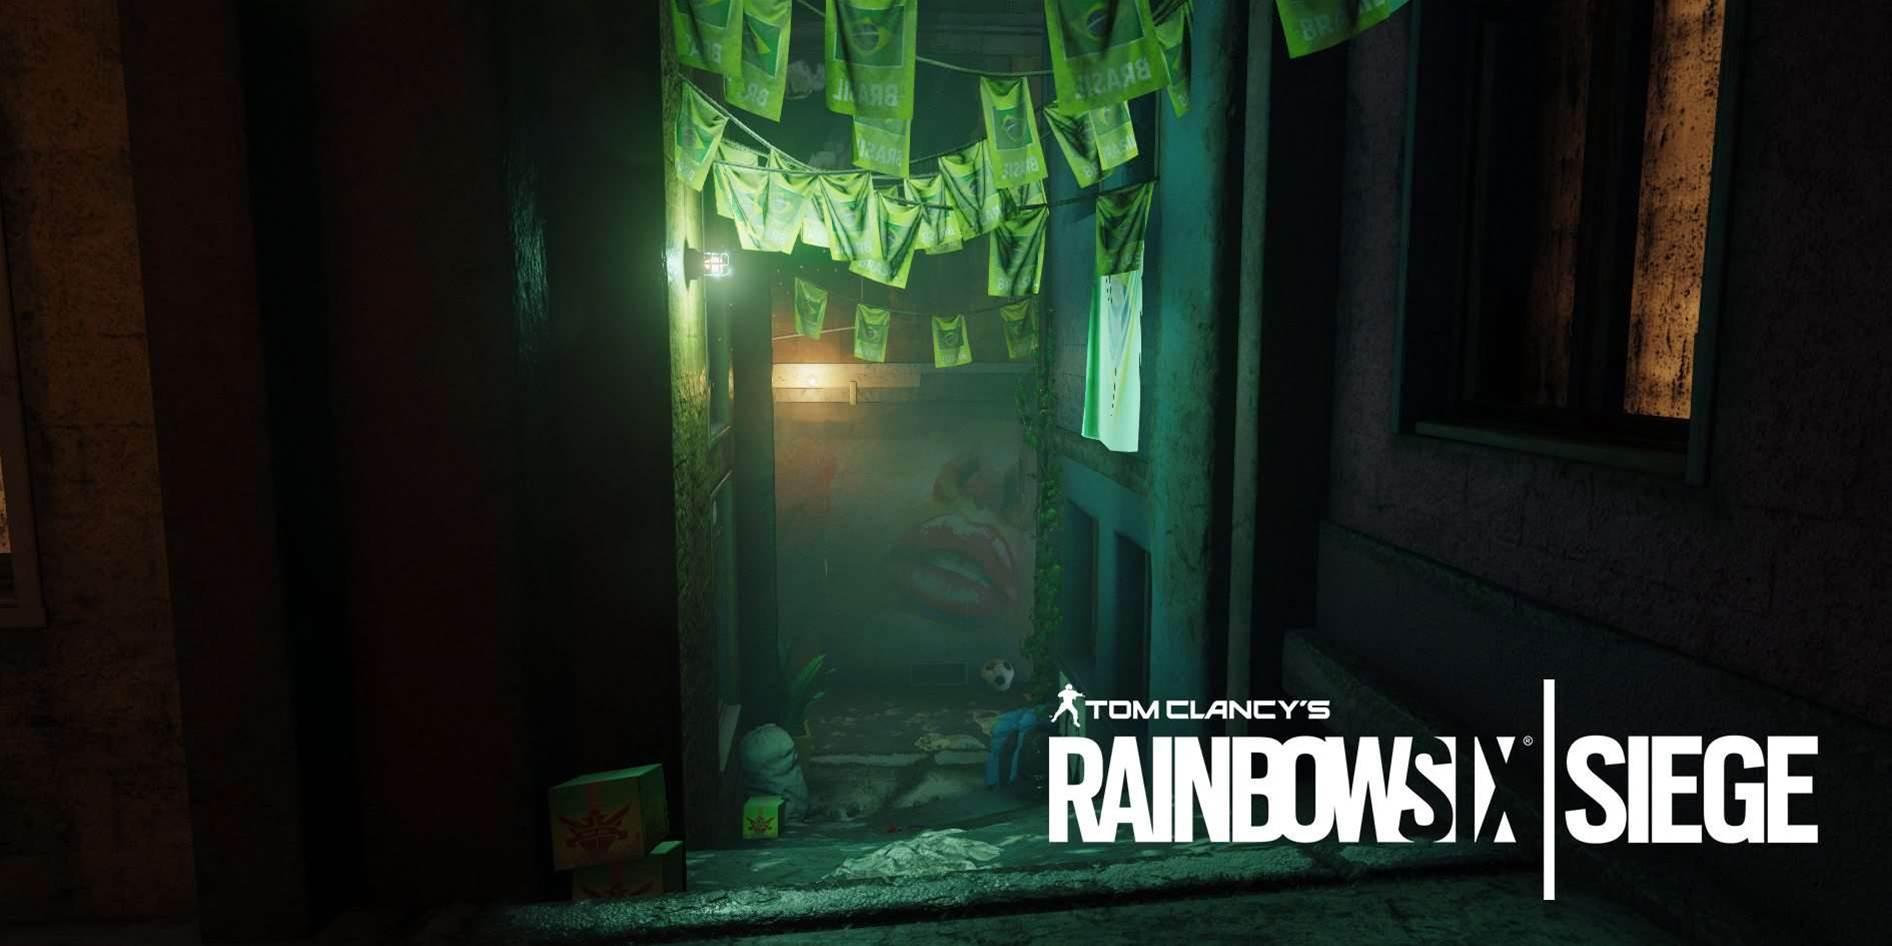 A handful of Rainbow Six Siege shots